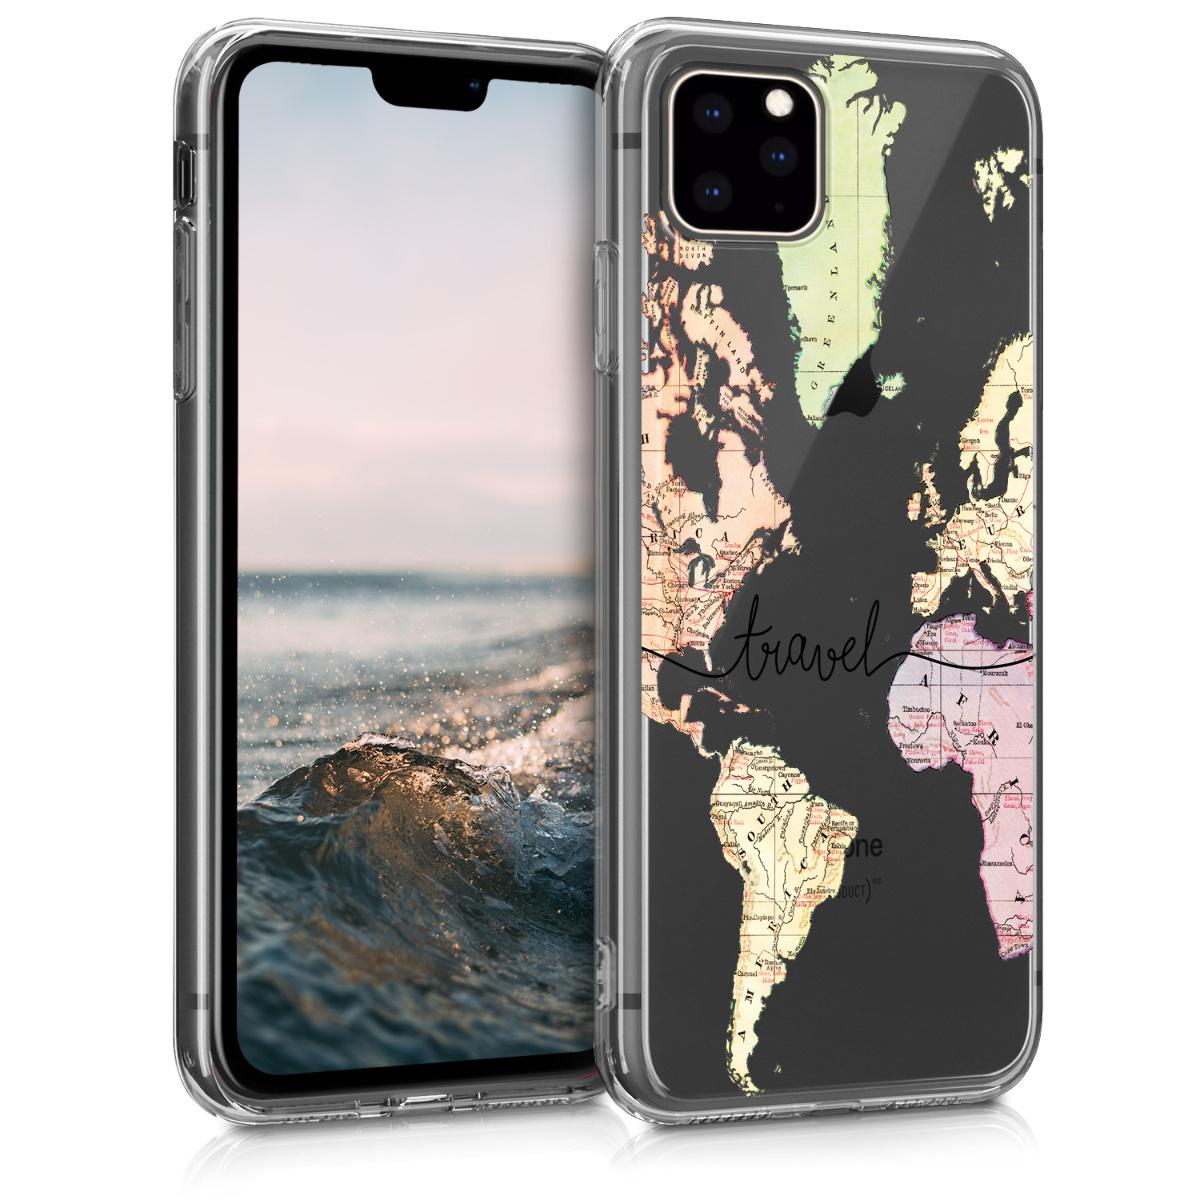 KW Θήκη Σιλικόνης iPhone 11 Pro Max -  Black / Multicolor / Transparent (49794.02)